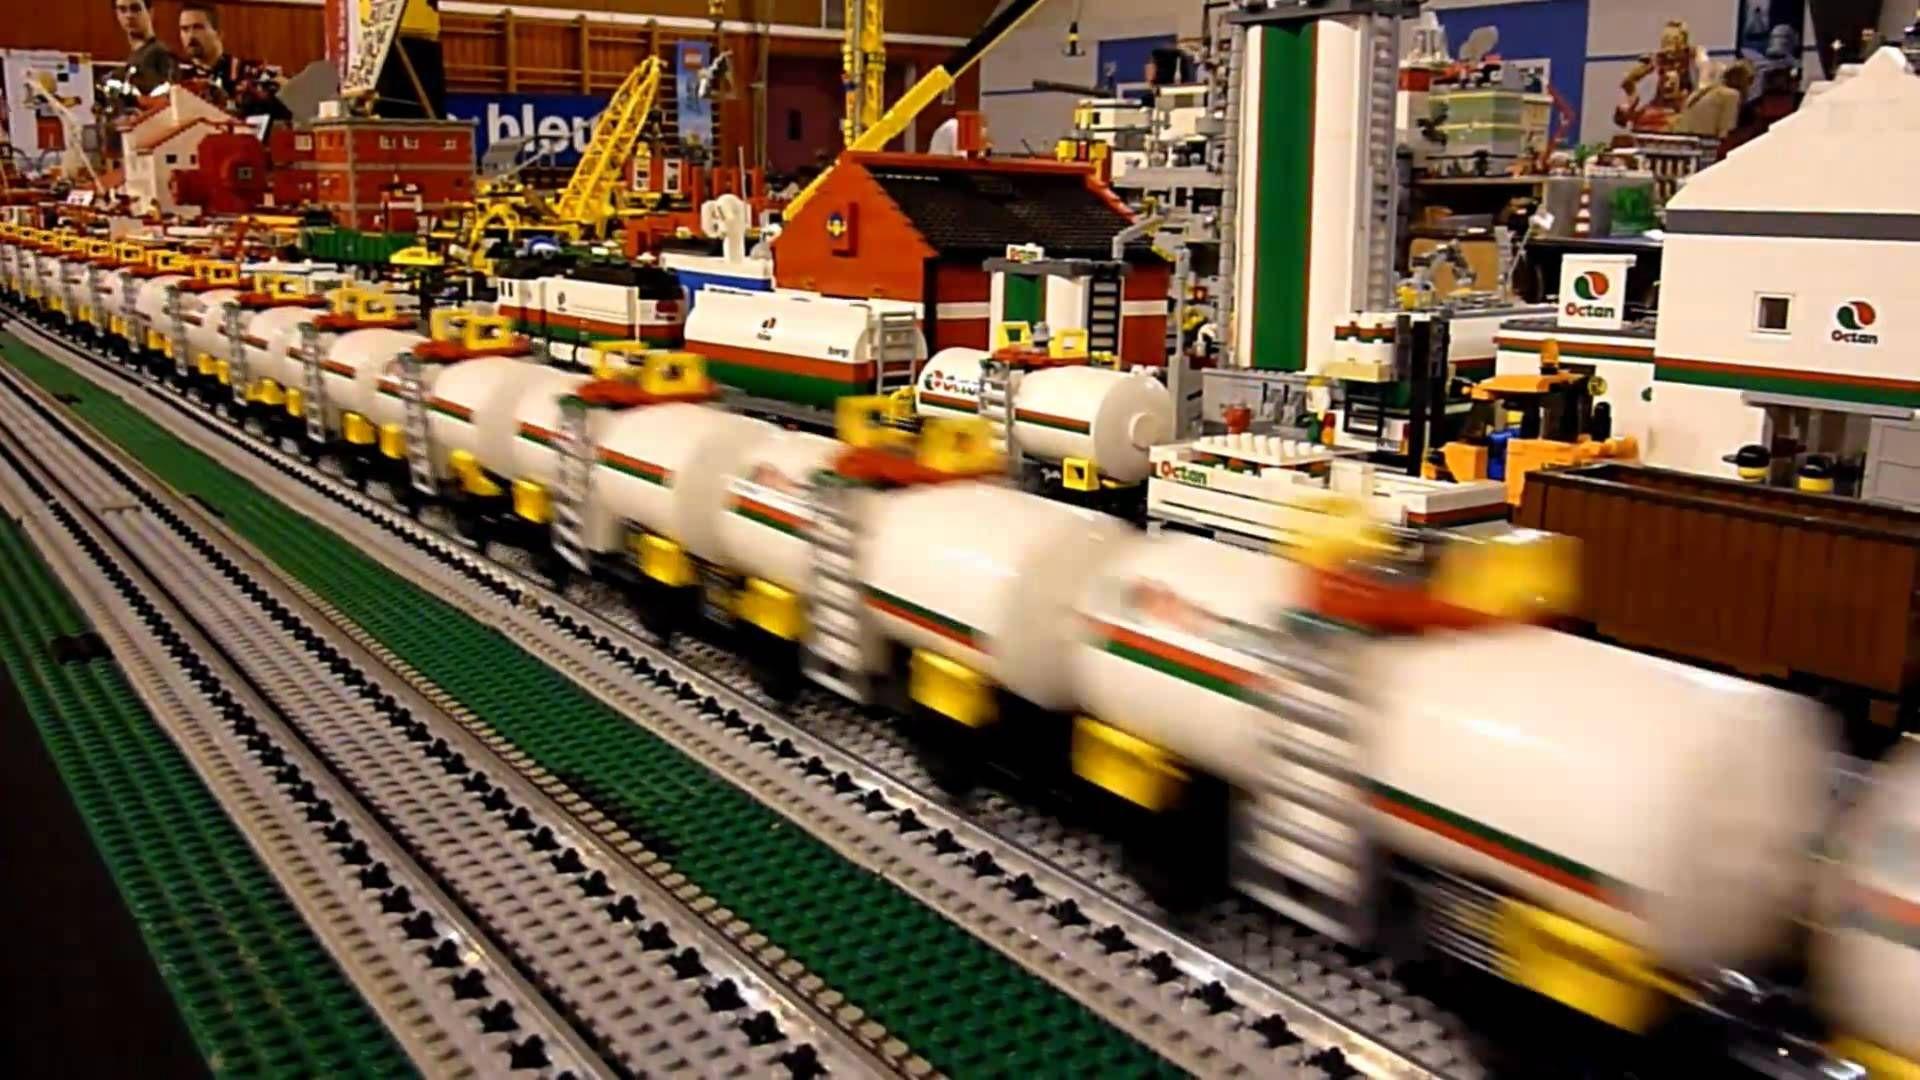 Train Lego Octan fast Legnome   Lego, Train, Travel